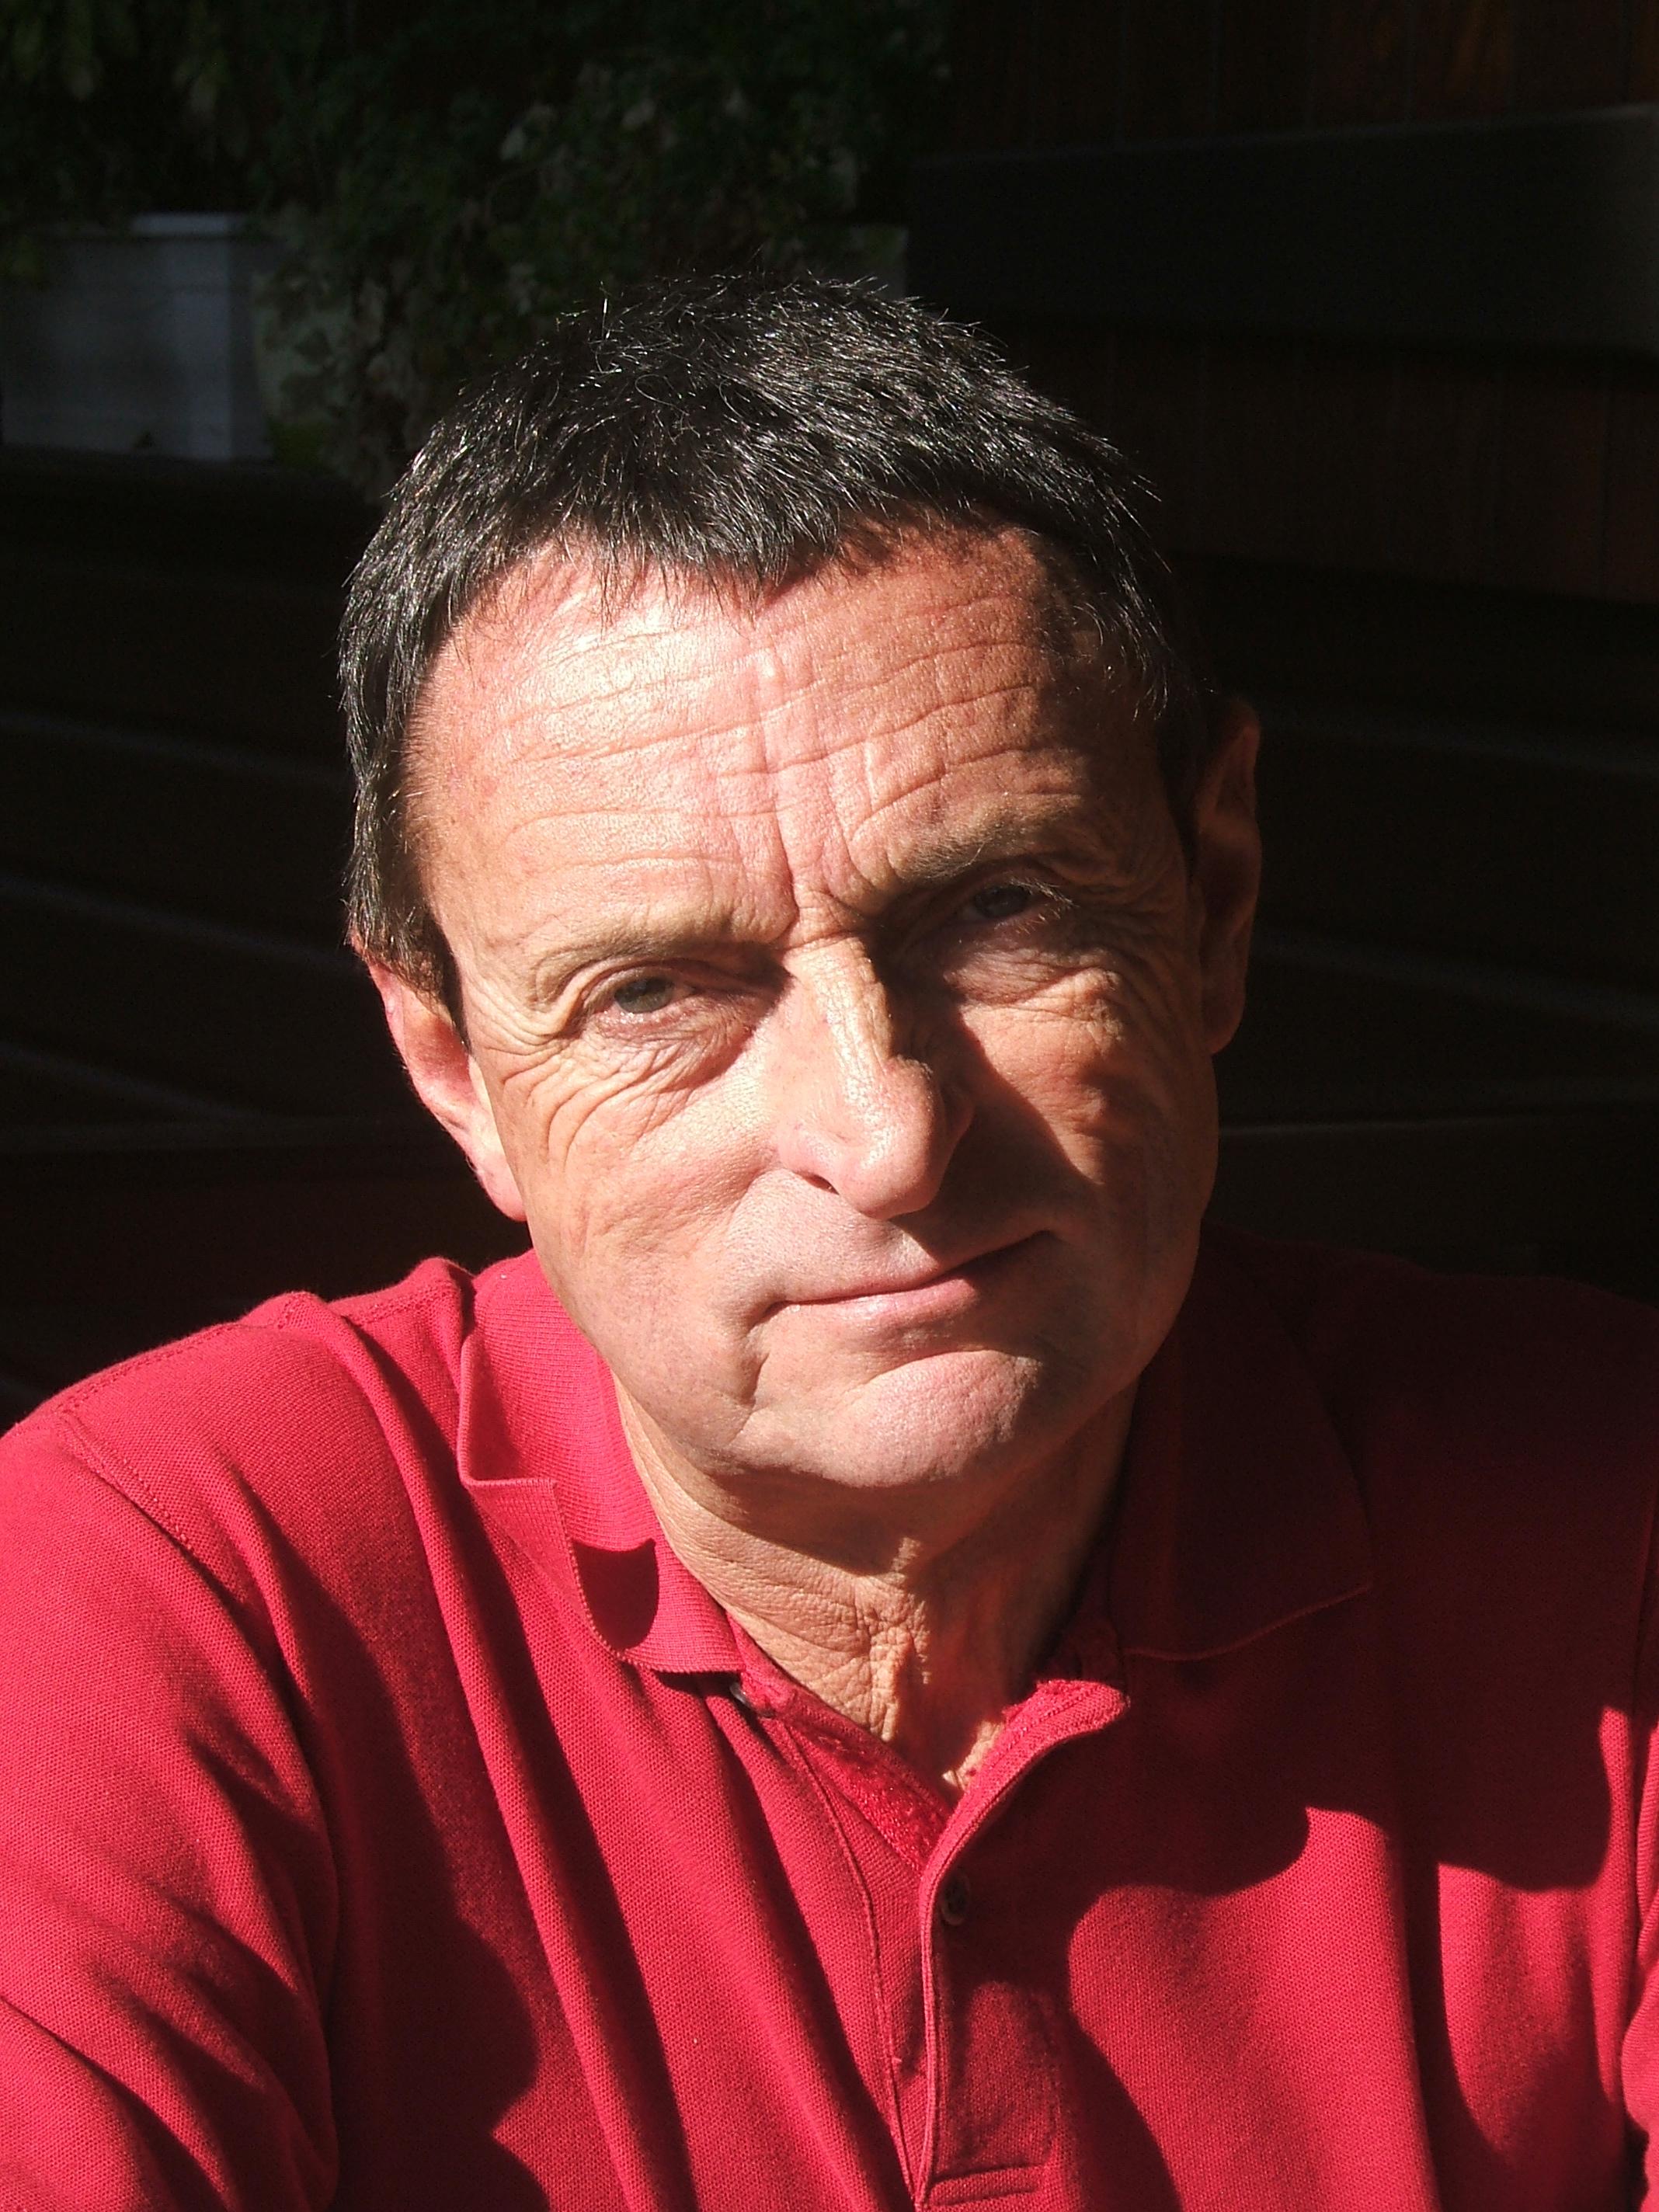 Choisir Savoie avec Guy Lecomte